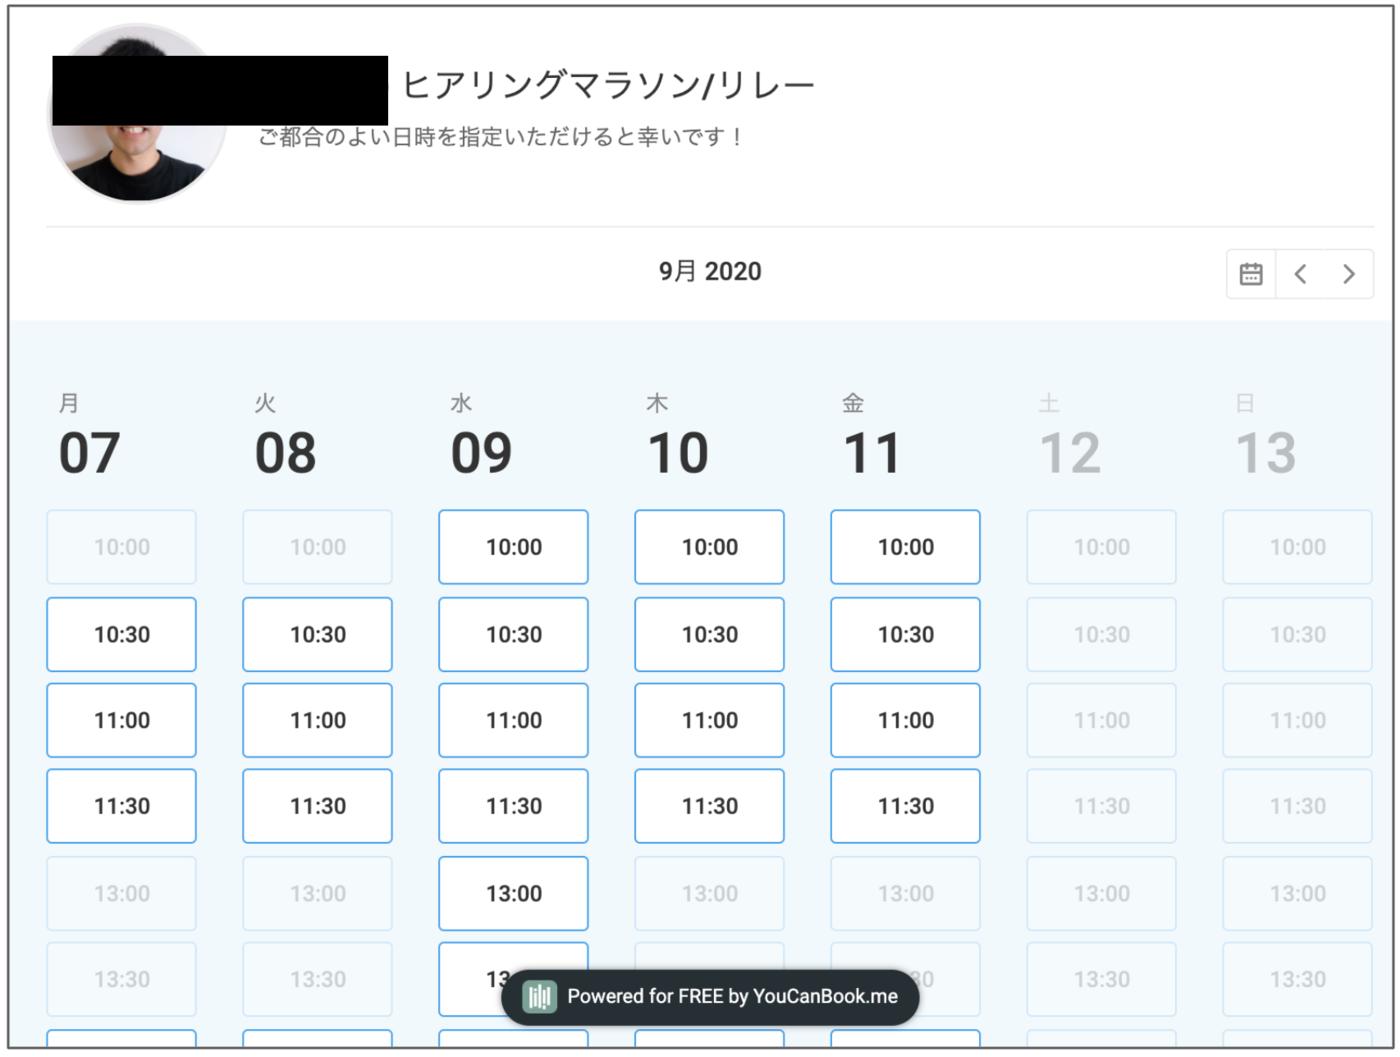 f:id:sohei:20201214221155p:plain:w400